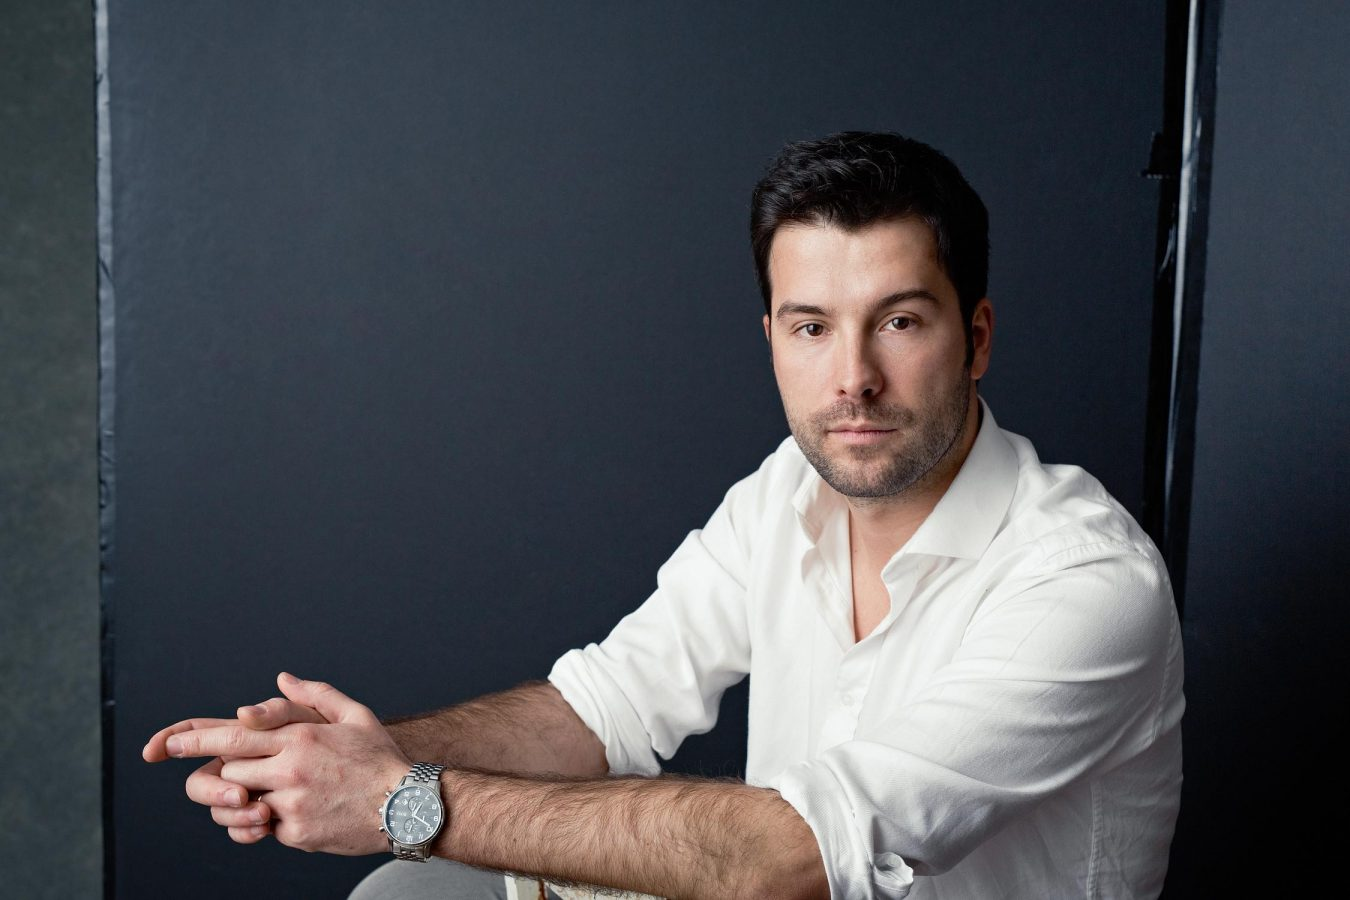 modern-studio-male-portrait